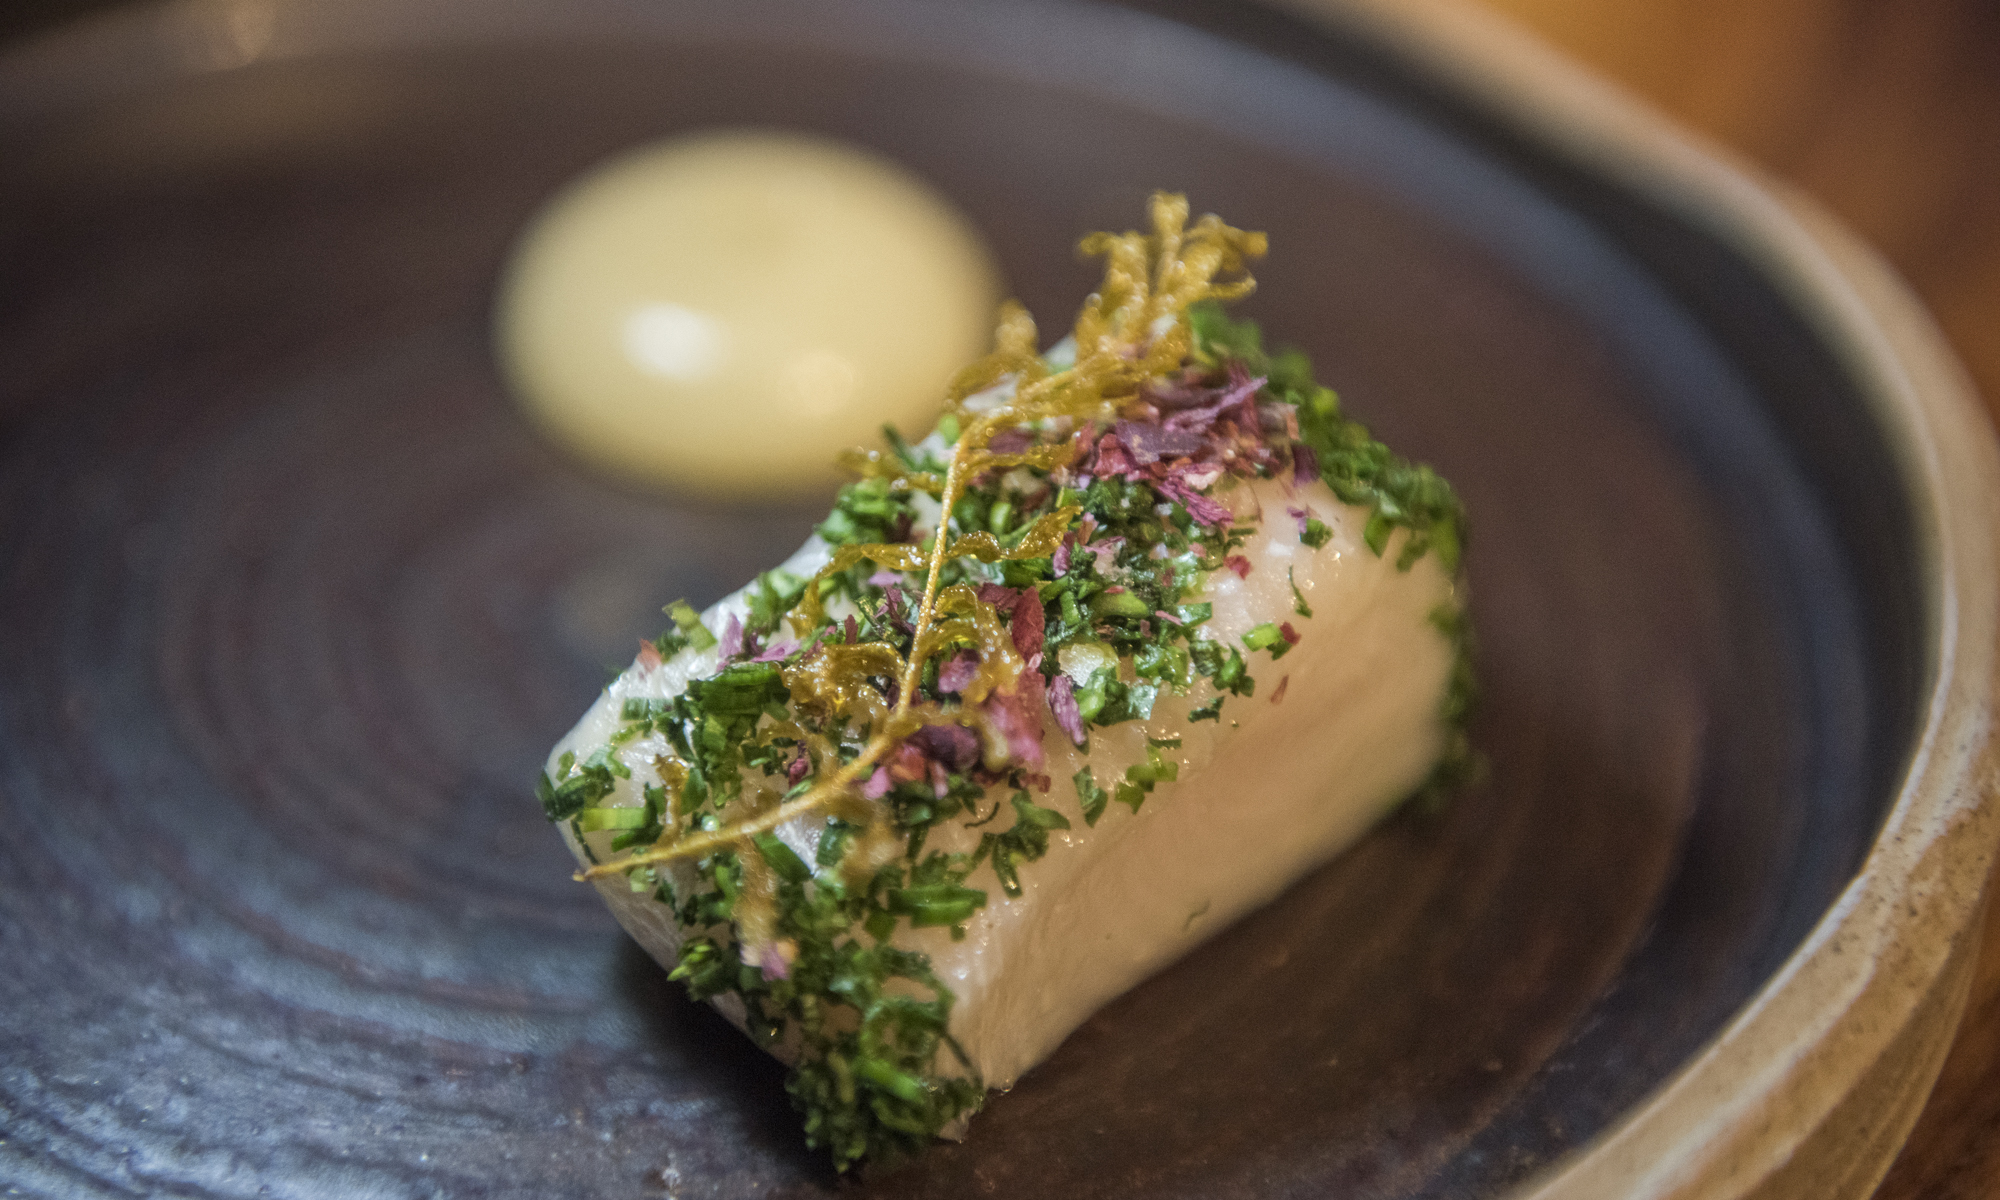 Toyo Eatery - mackerel.jpg (original size)